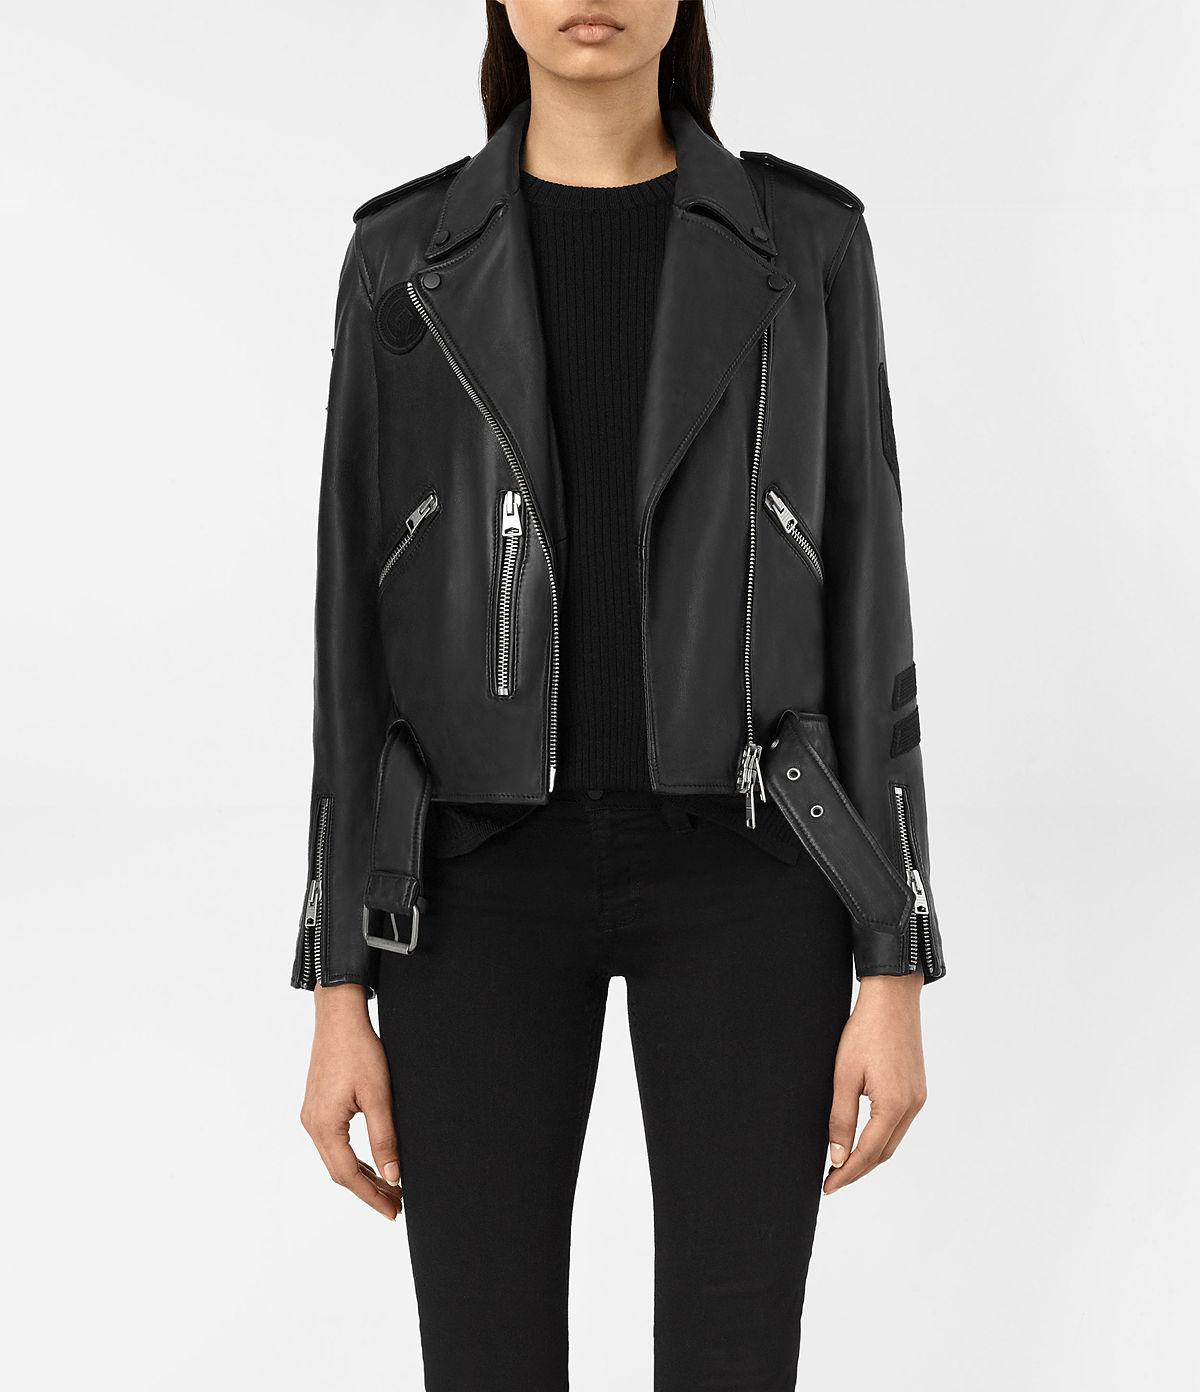 Leather jacket all saints - Allsaints Uk Leather Jackets For Women Now